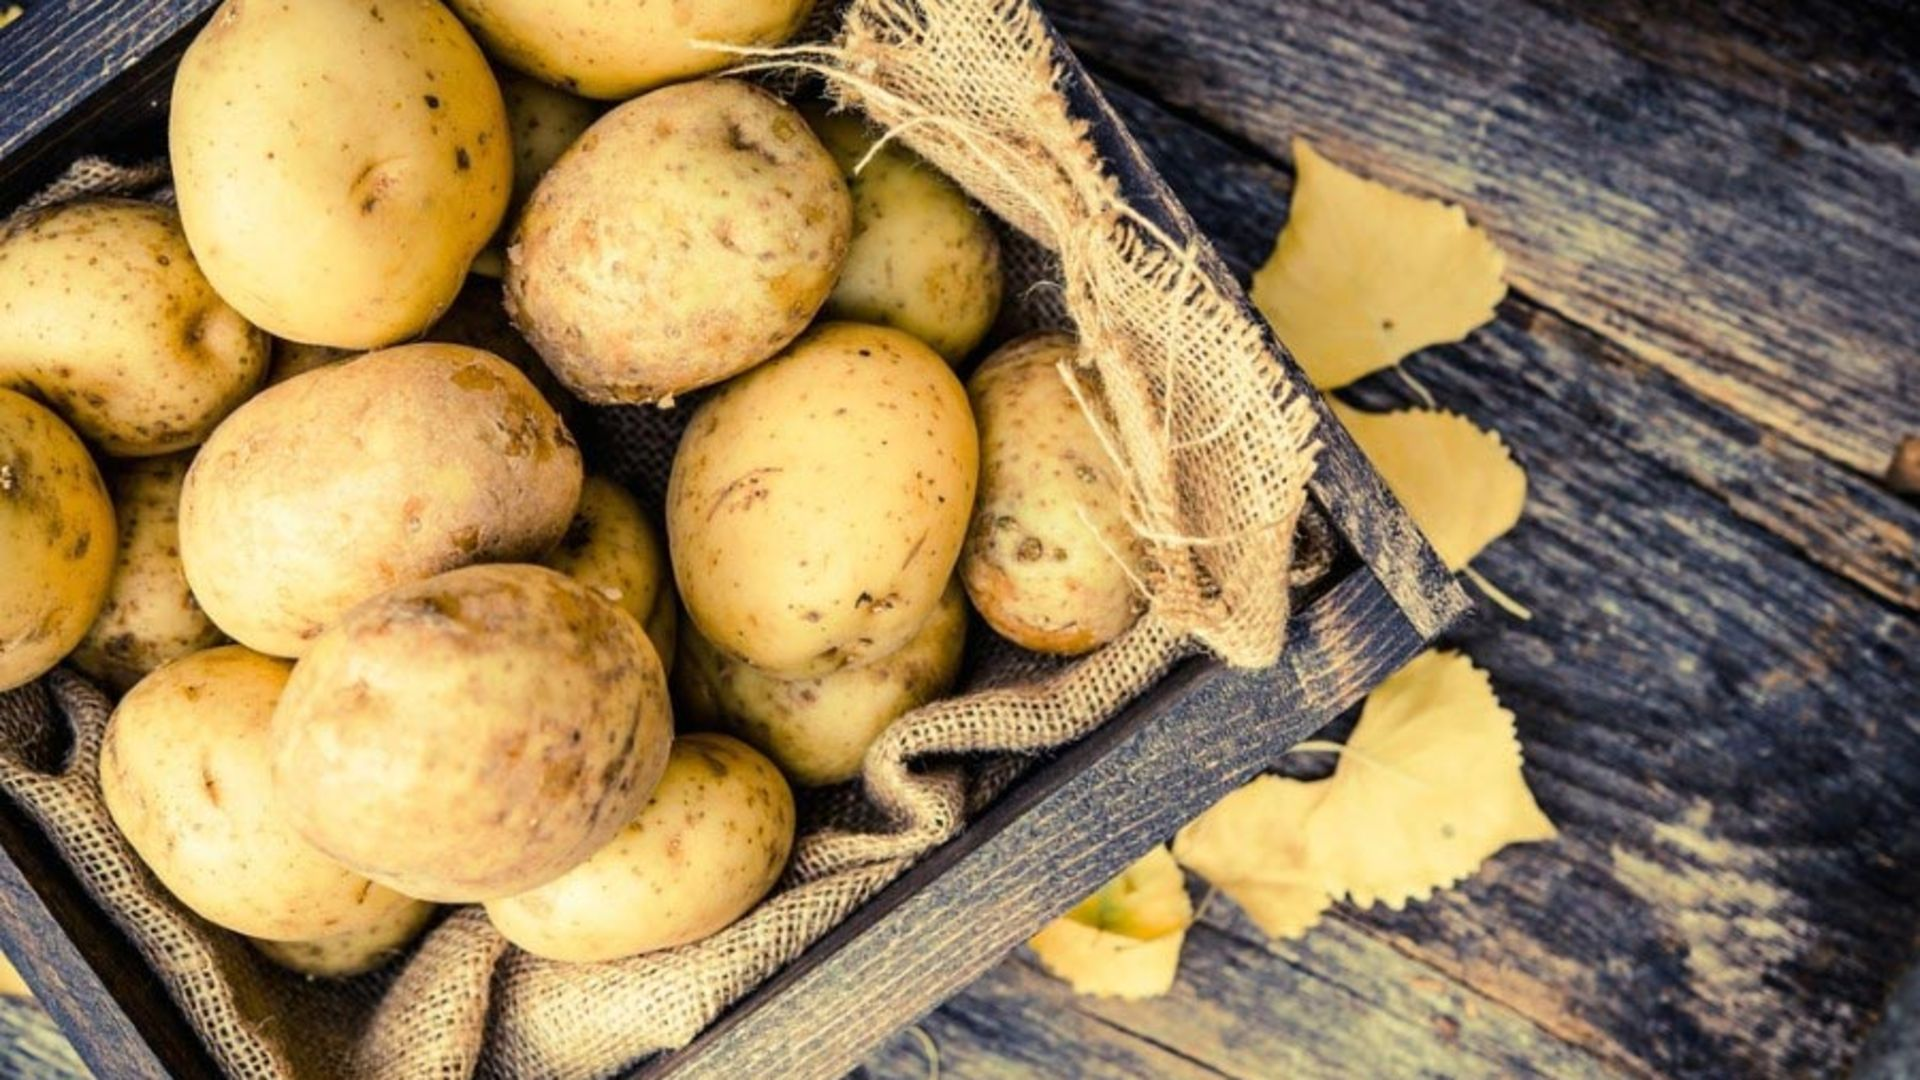 Rüyada Topraktan Patates Soğan Çıkarmak